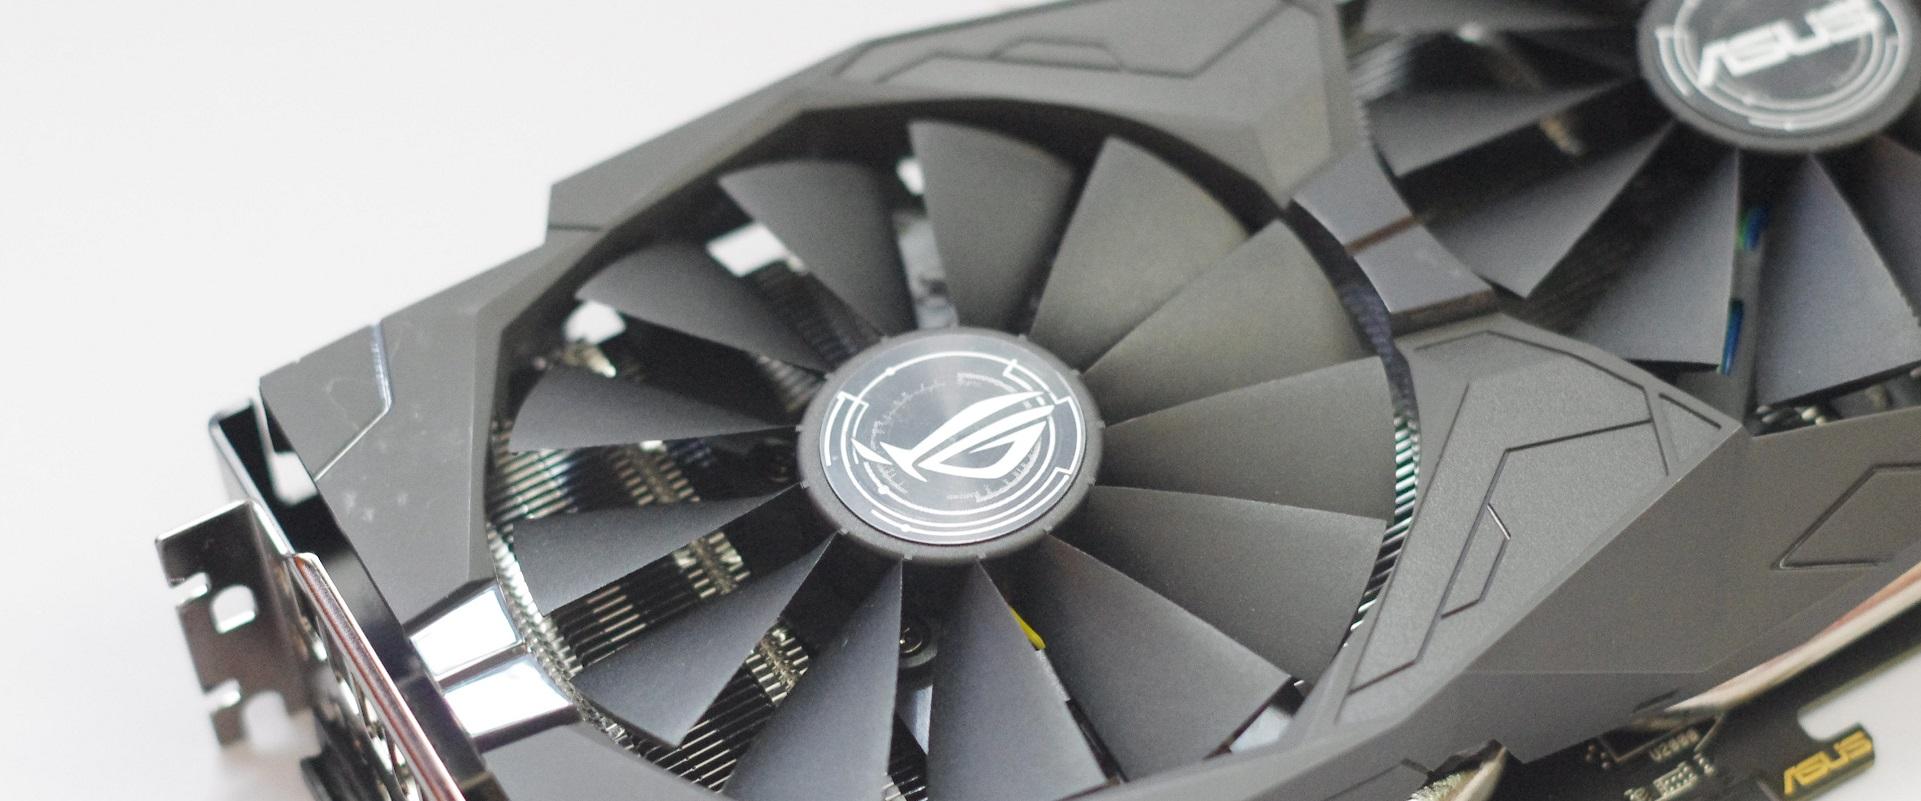 ASUS STRIX RX 570 4GB OC - Đánh Giá Gaming Gear